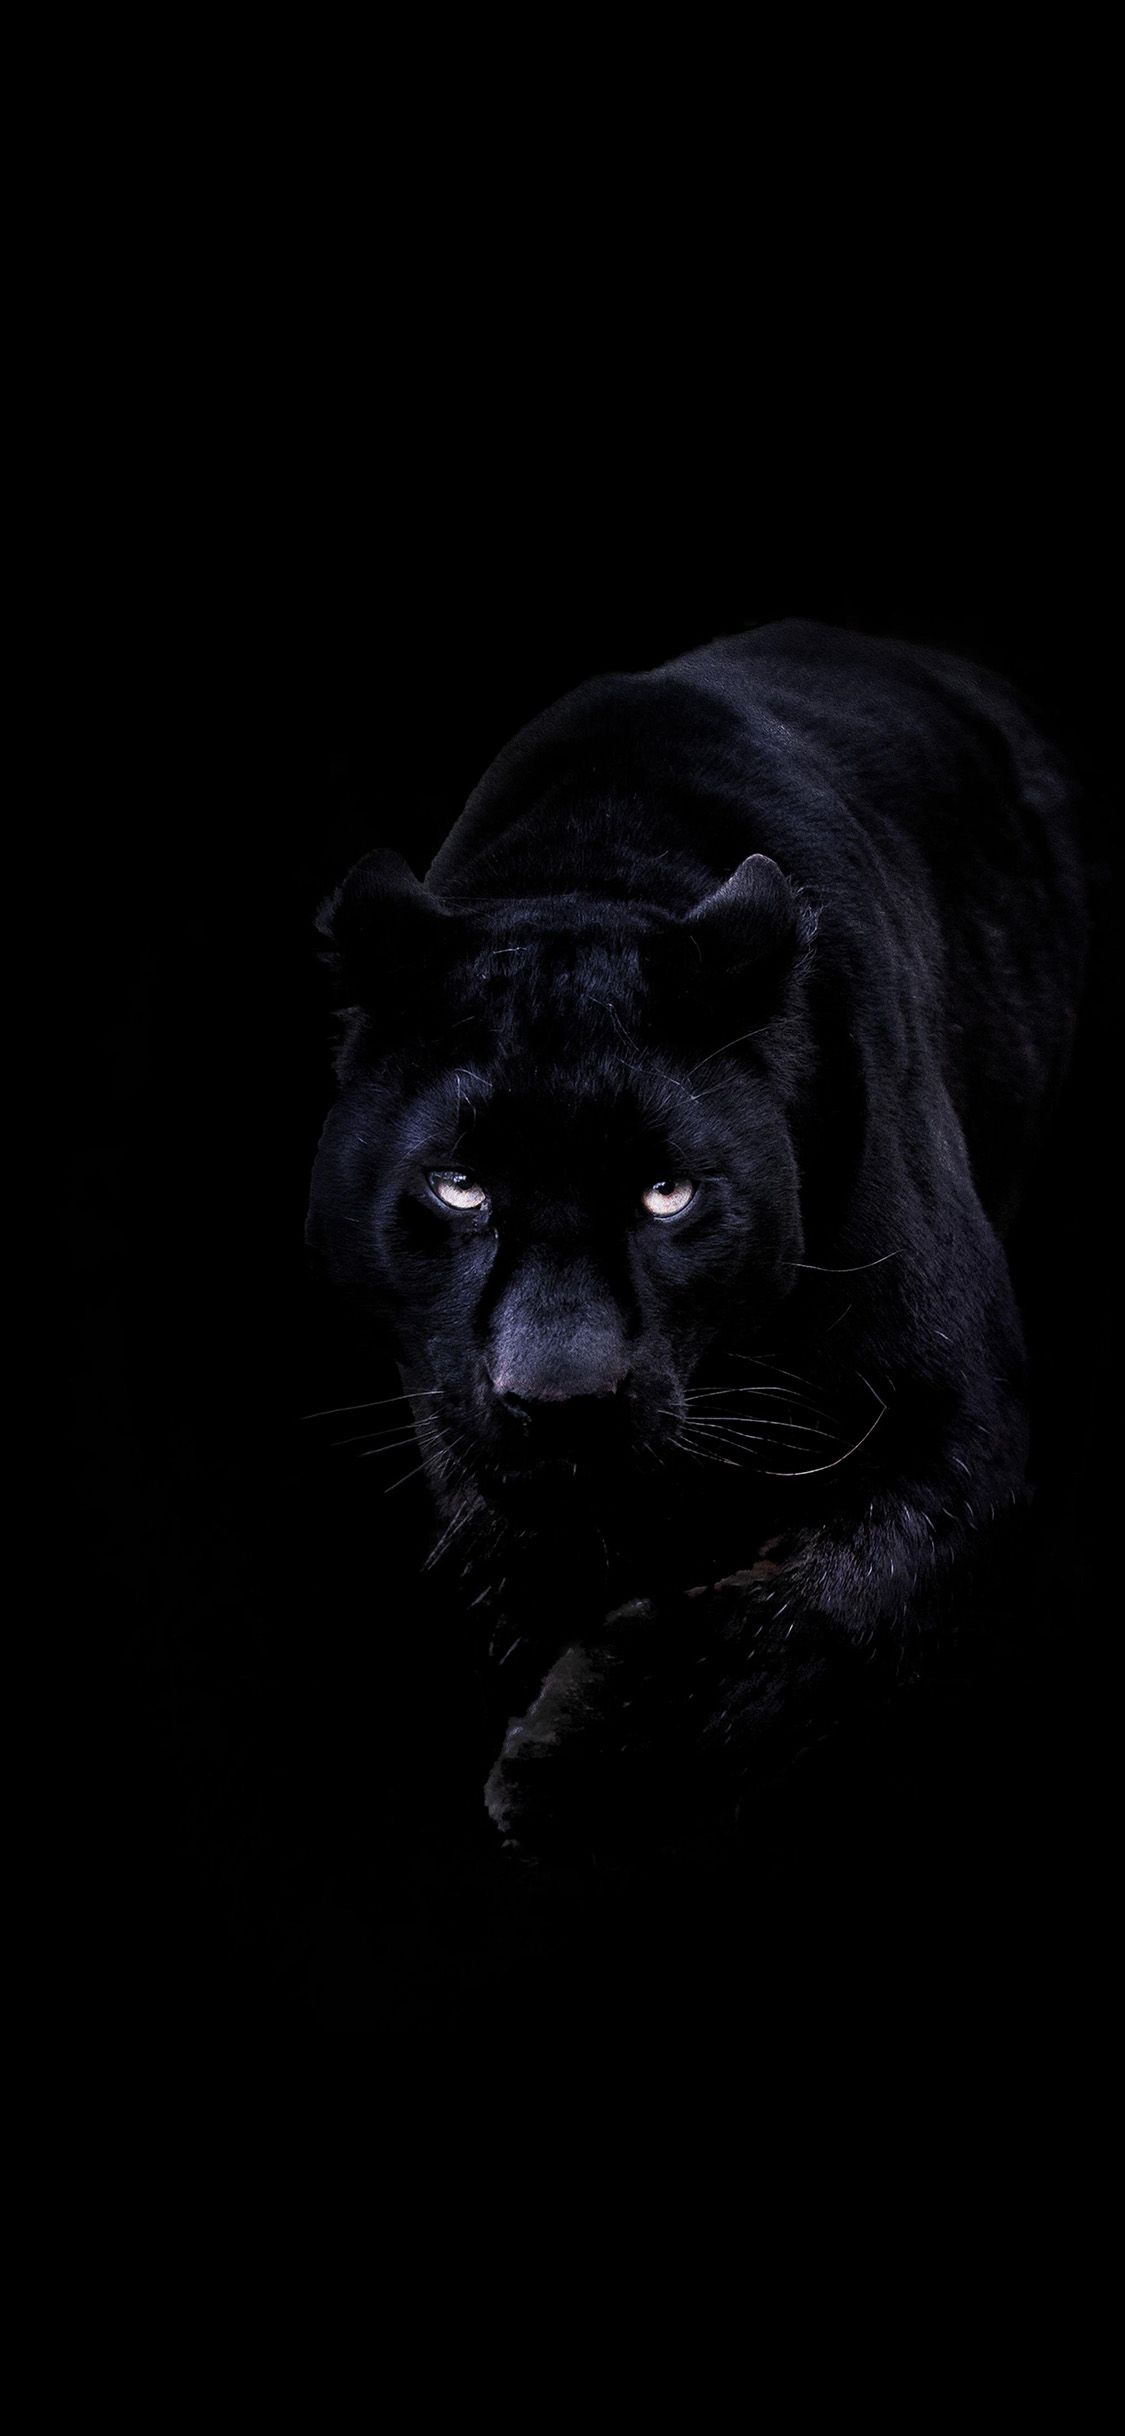 Pin By Balu Prasad On Dark Black In 2019 Cat Wallpaper